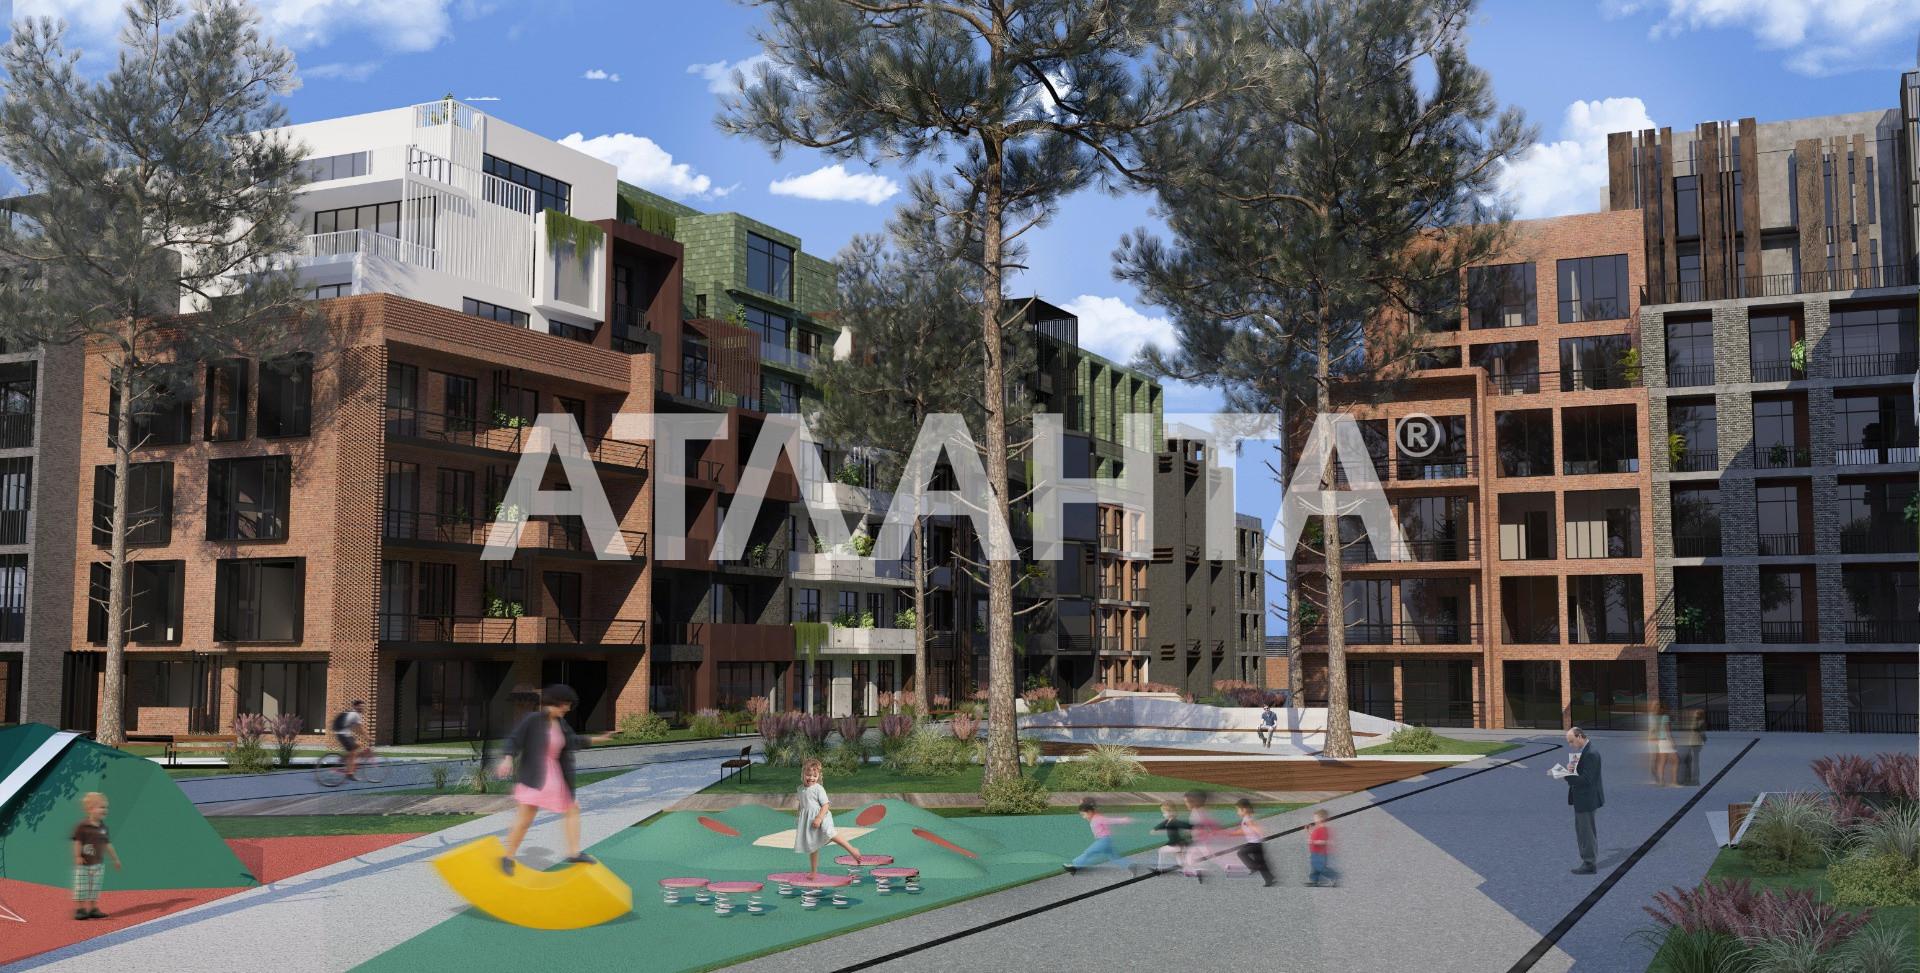 Продается 1-комнатная Квартира на ул. Донского Дмитрия — 45 020 у.е. (фото №2)